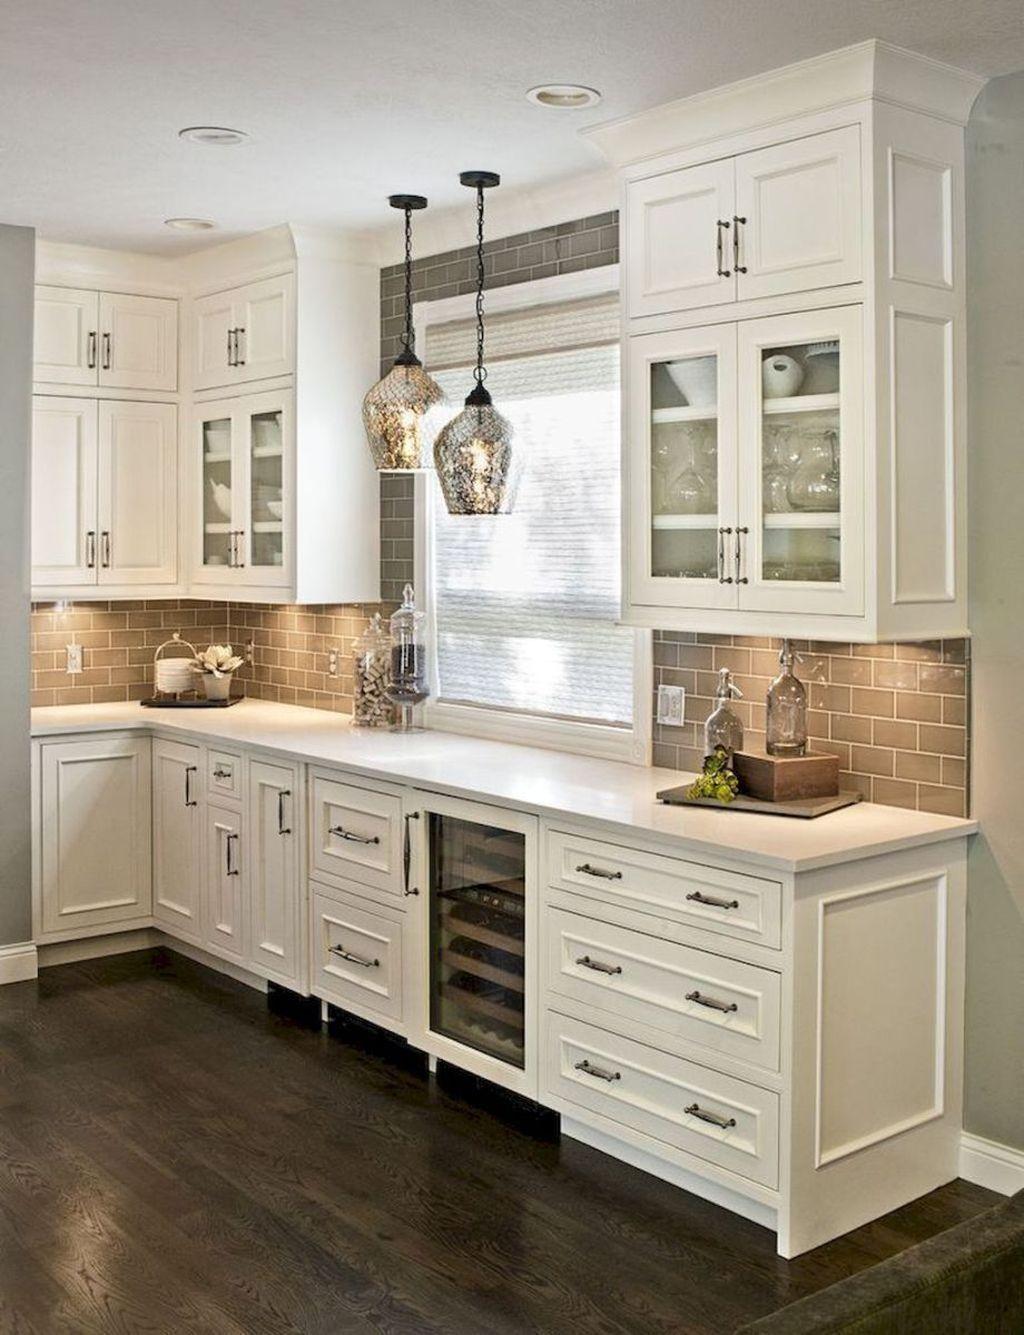 30 Stunning Rustic Farmhouse Kitchen Cabinets Decoration Ideas Rustic Kitchen Cabinets Kitchen Cabinets Decor Kitchen Cabinet Design